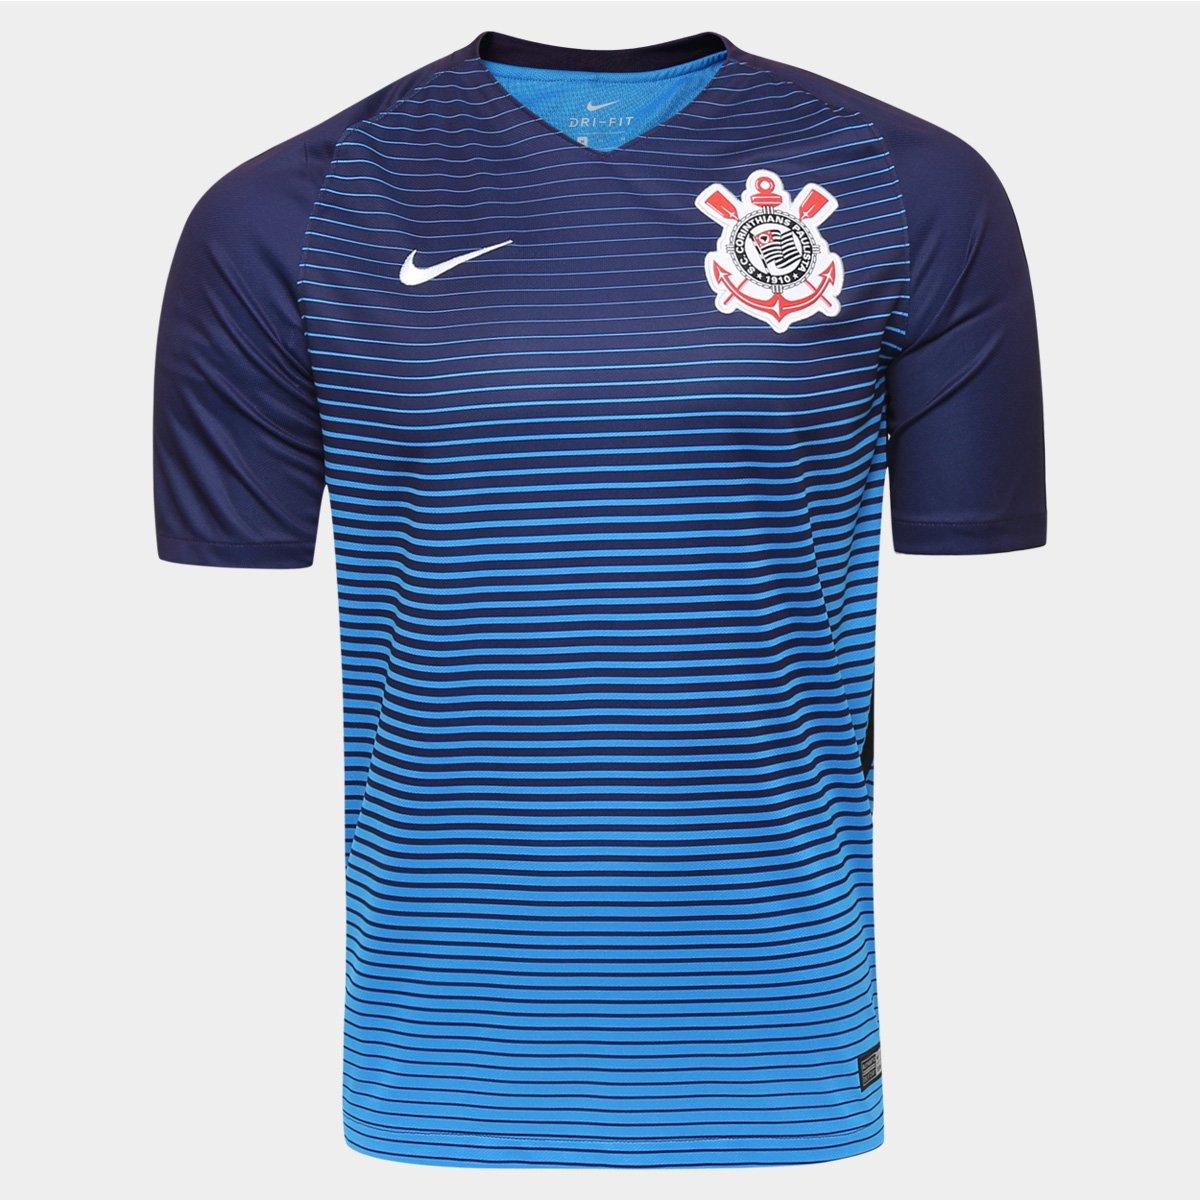 Camisa Corinthians III 2016 s nº Torcedor Nike Masculina - Compre ... 040b550390c4d